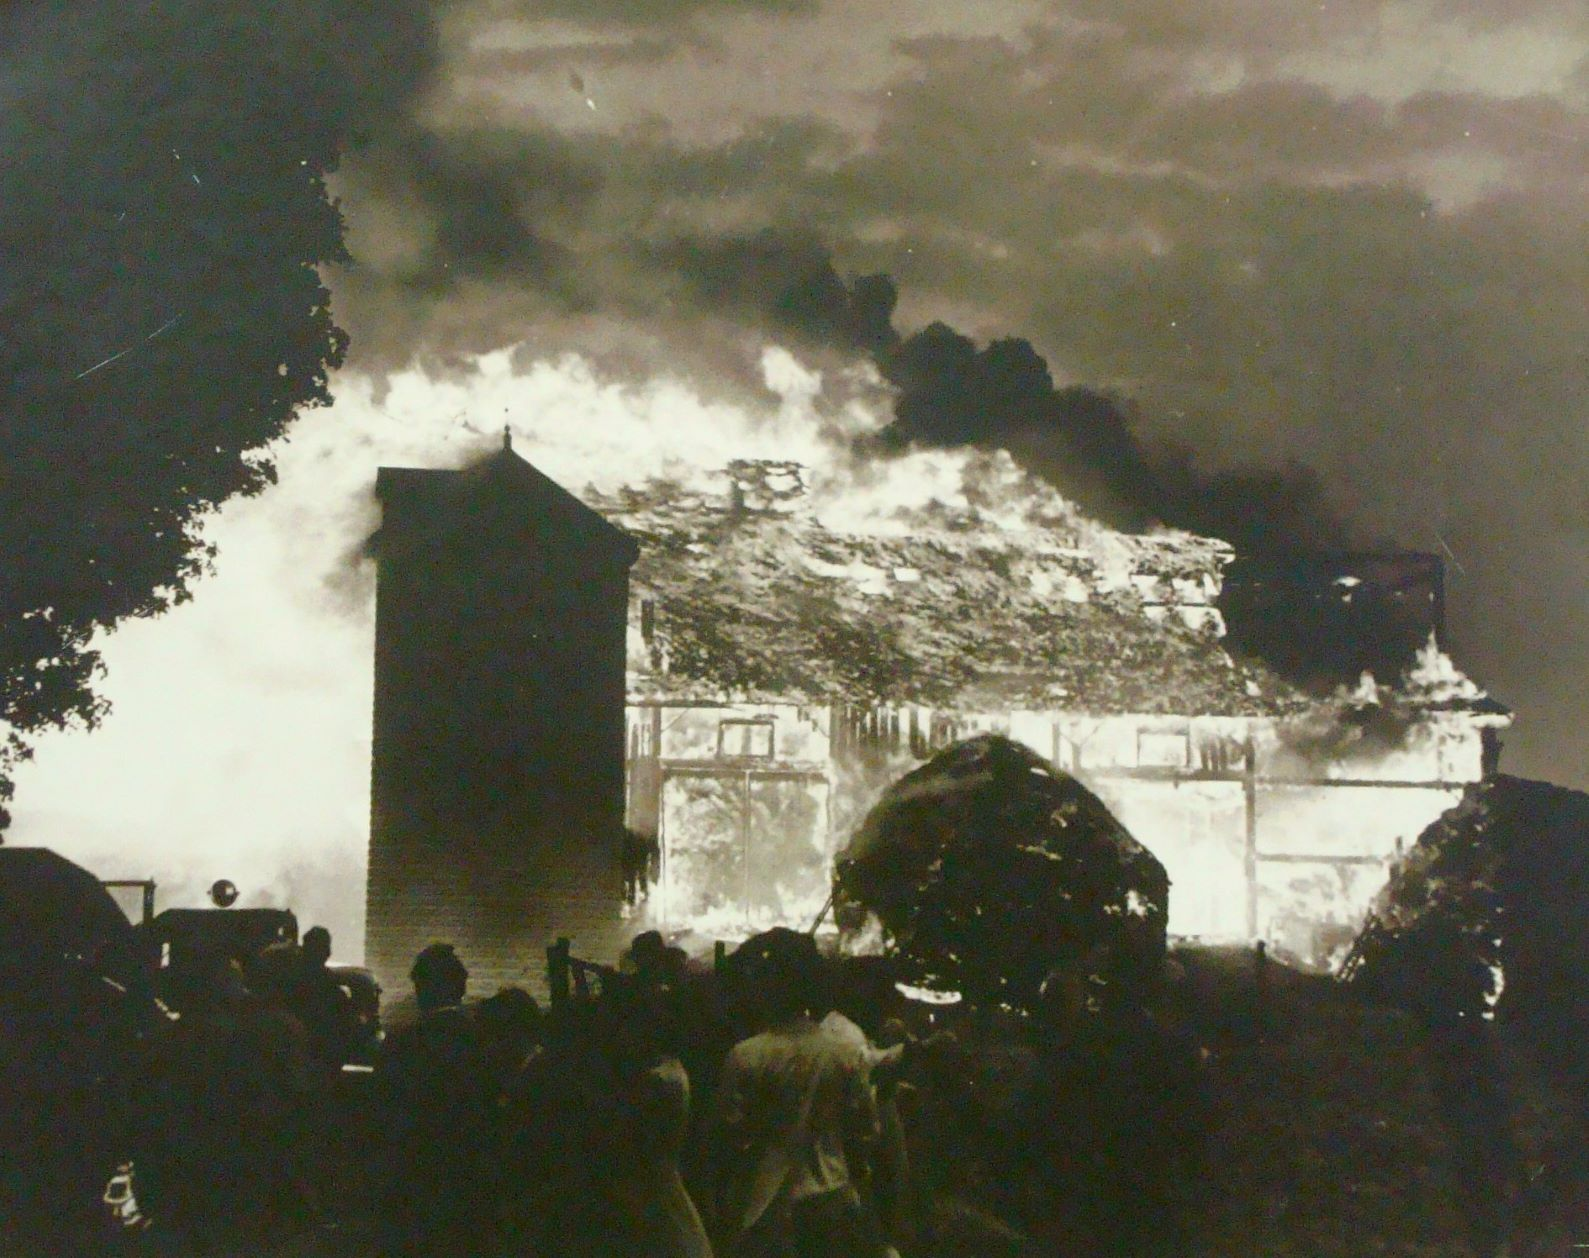 Fire at the Hamilton Insane Asylum 1911